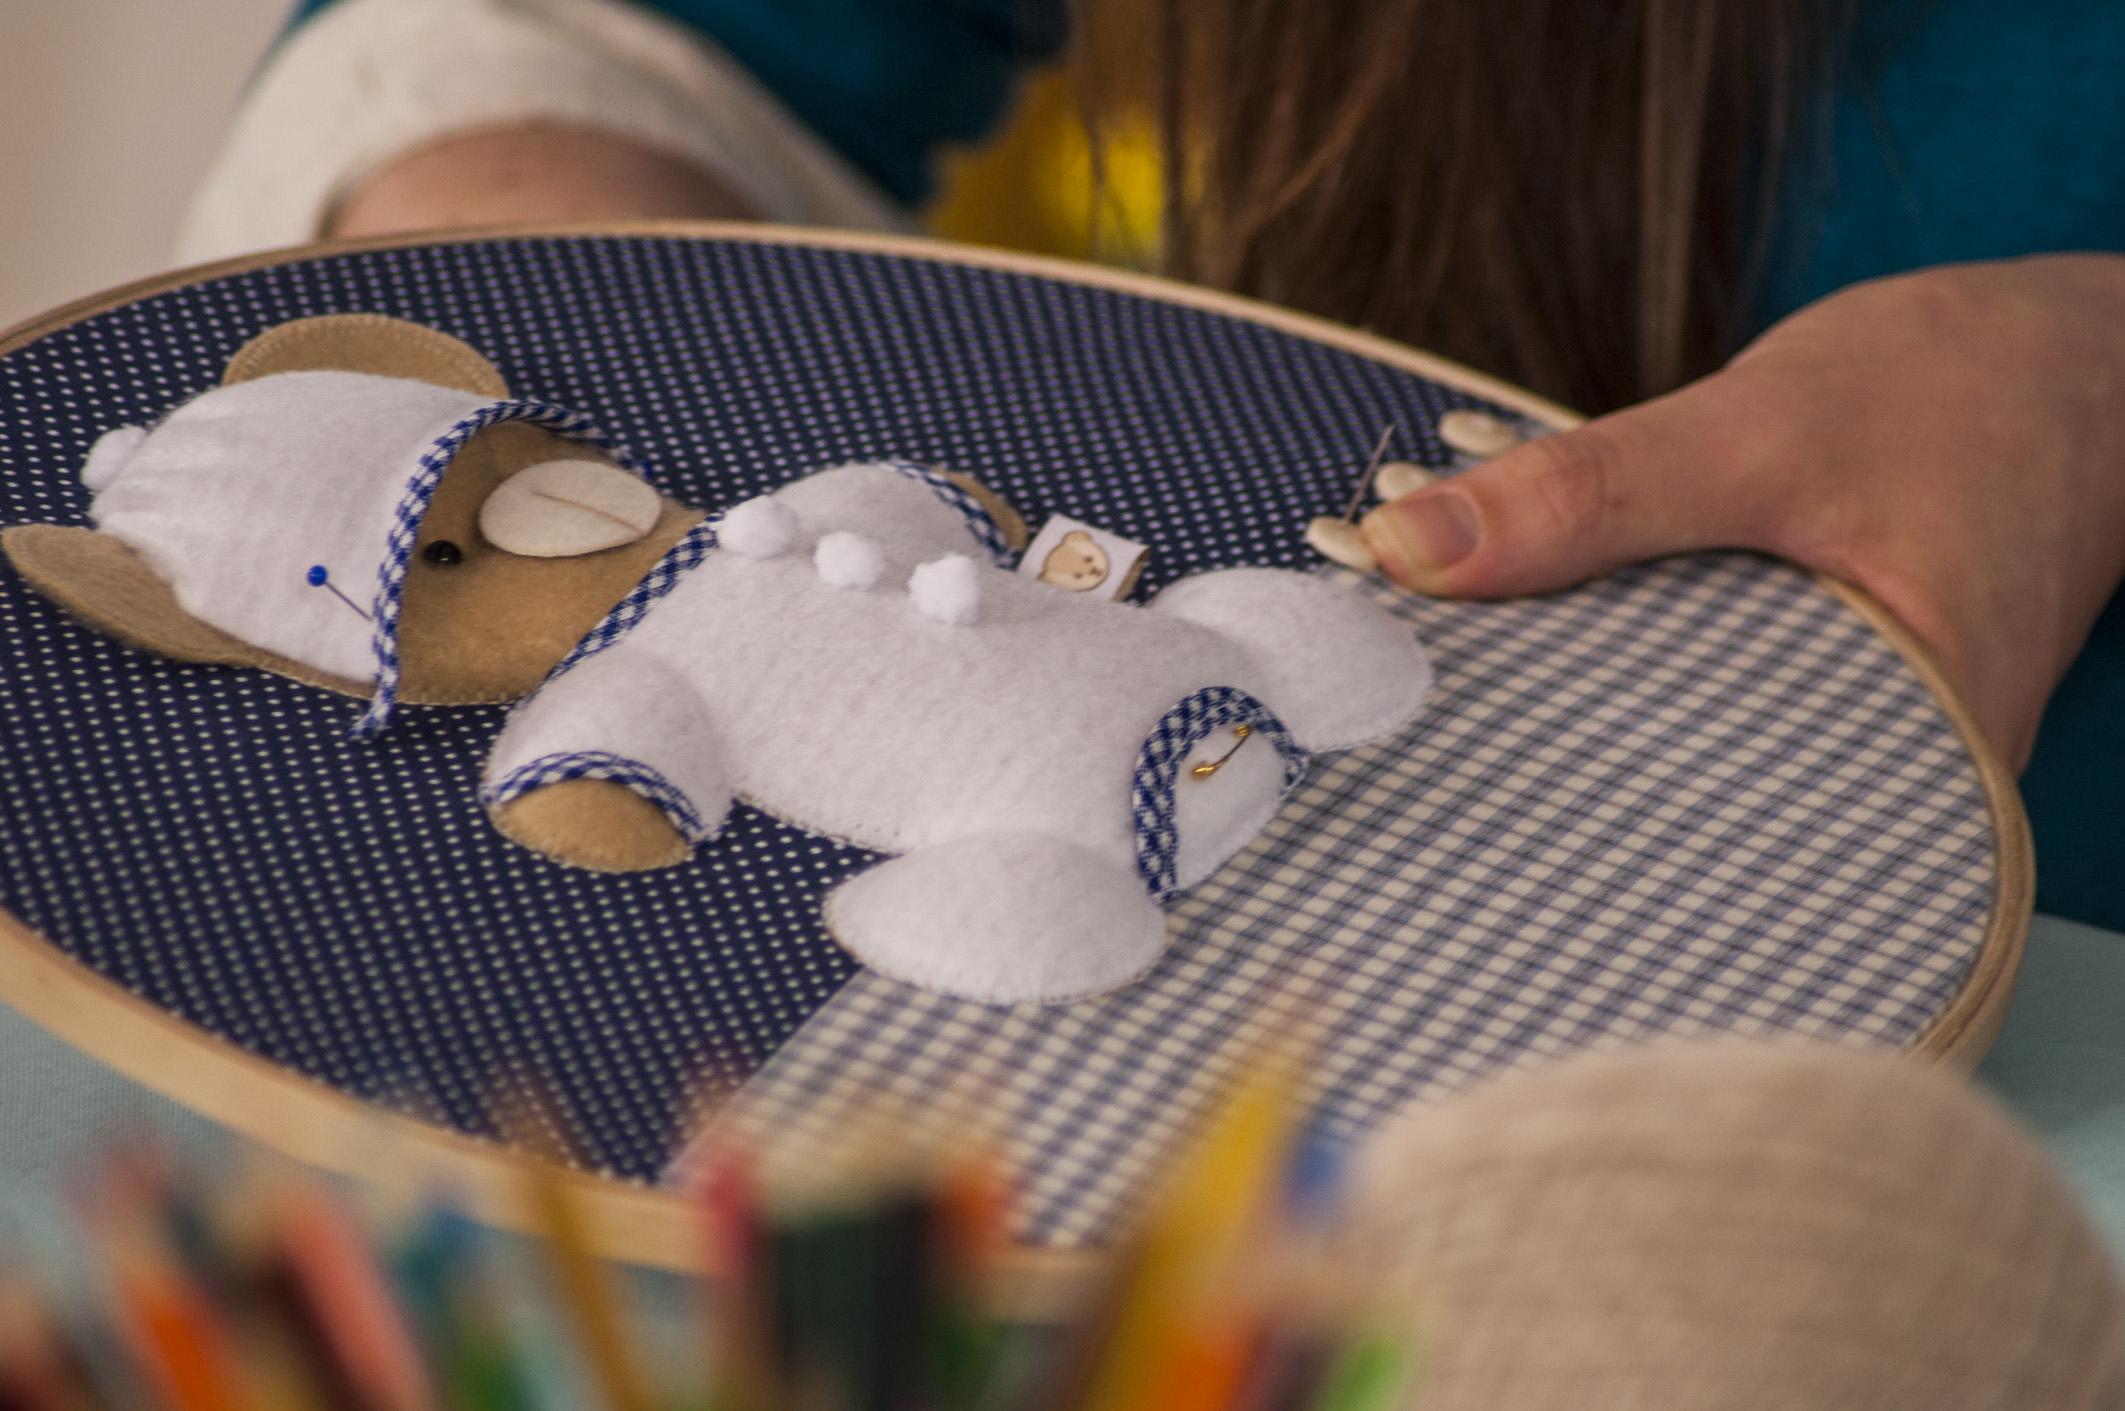 Enxoval Para Beb Mundo Dos Sonhos De D Bora Radtke ~ Artesanato Em Feltro Para Quarto De Bebe Menino